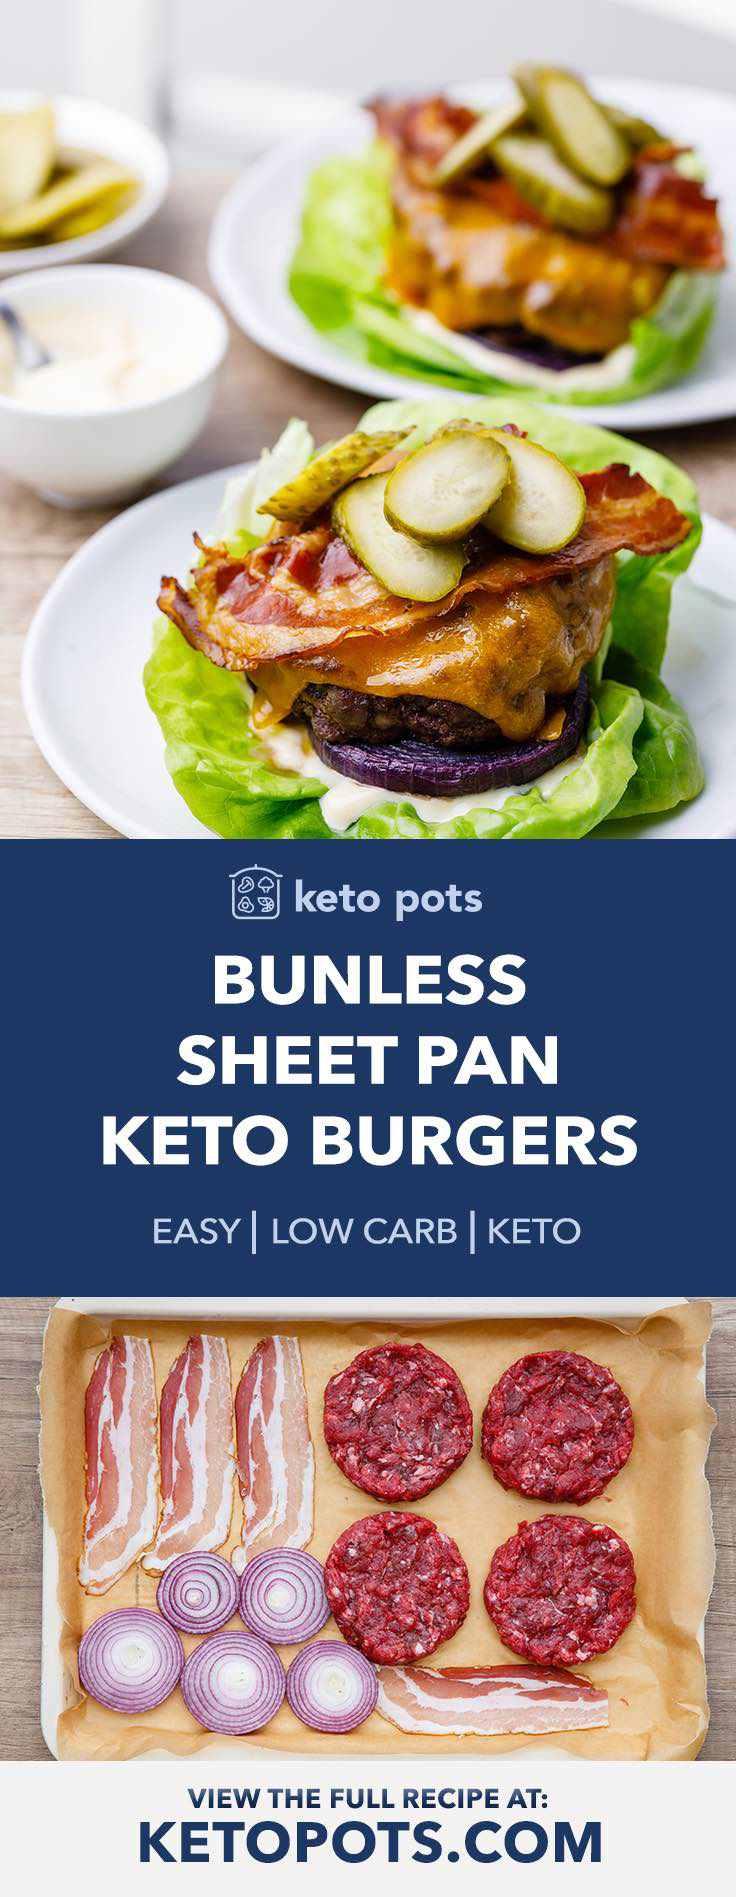 Easy sheet pan keto burgers.